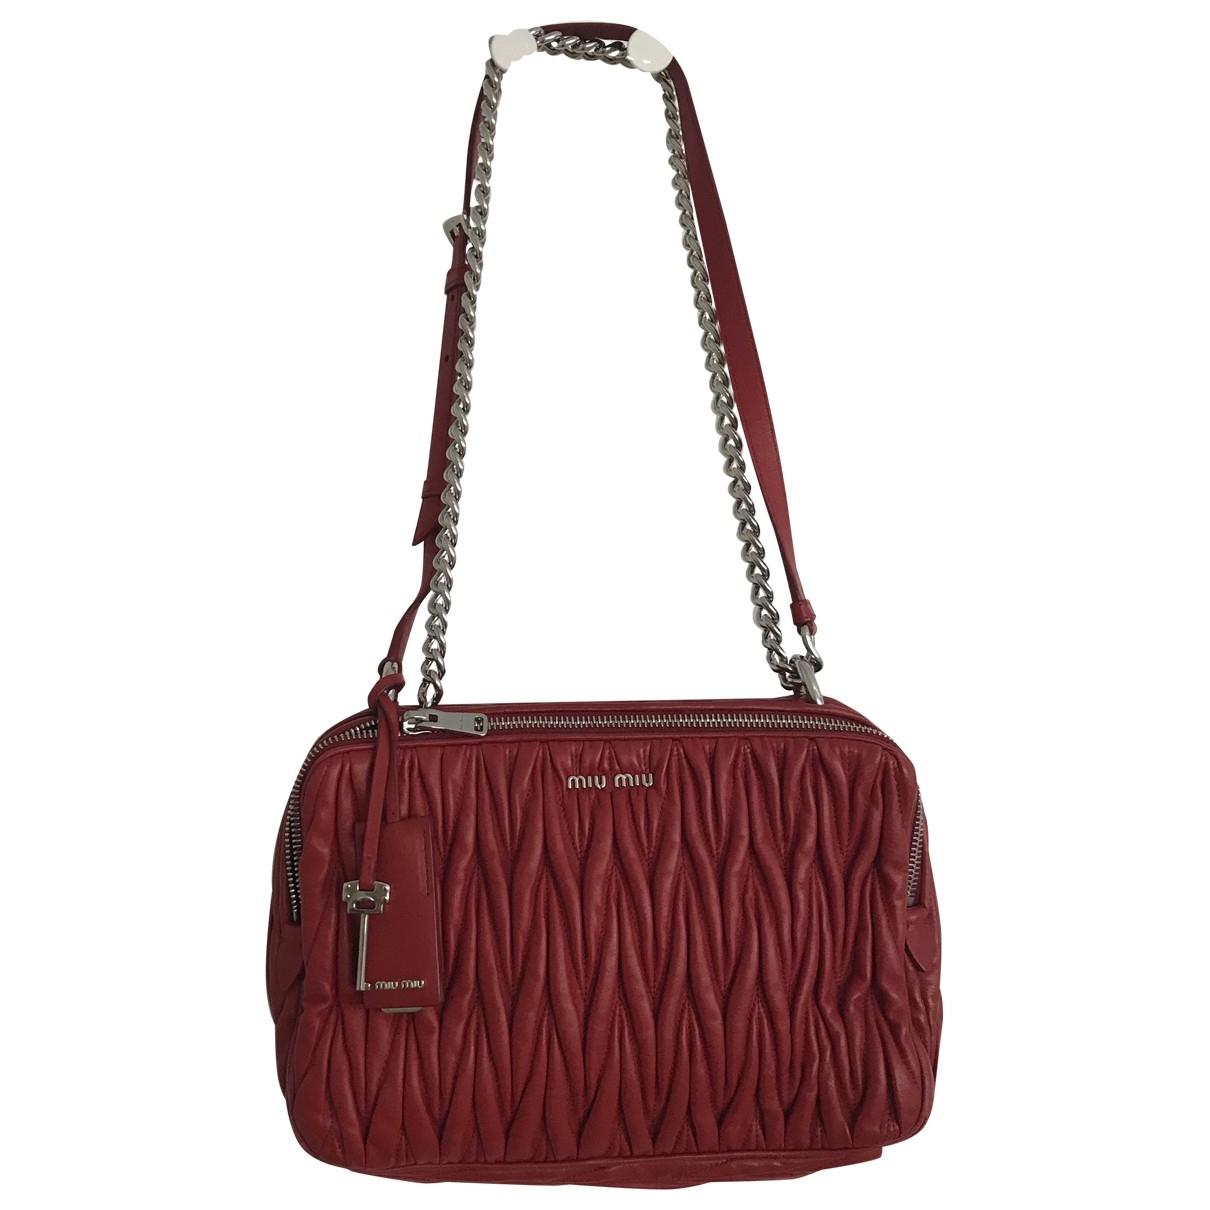 Miu Miu Matelasse Handtasche in  Rot Leder